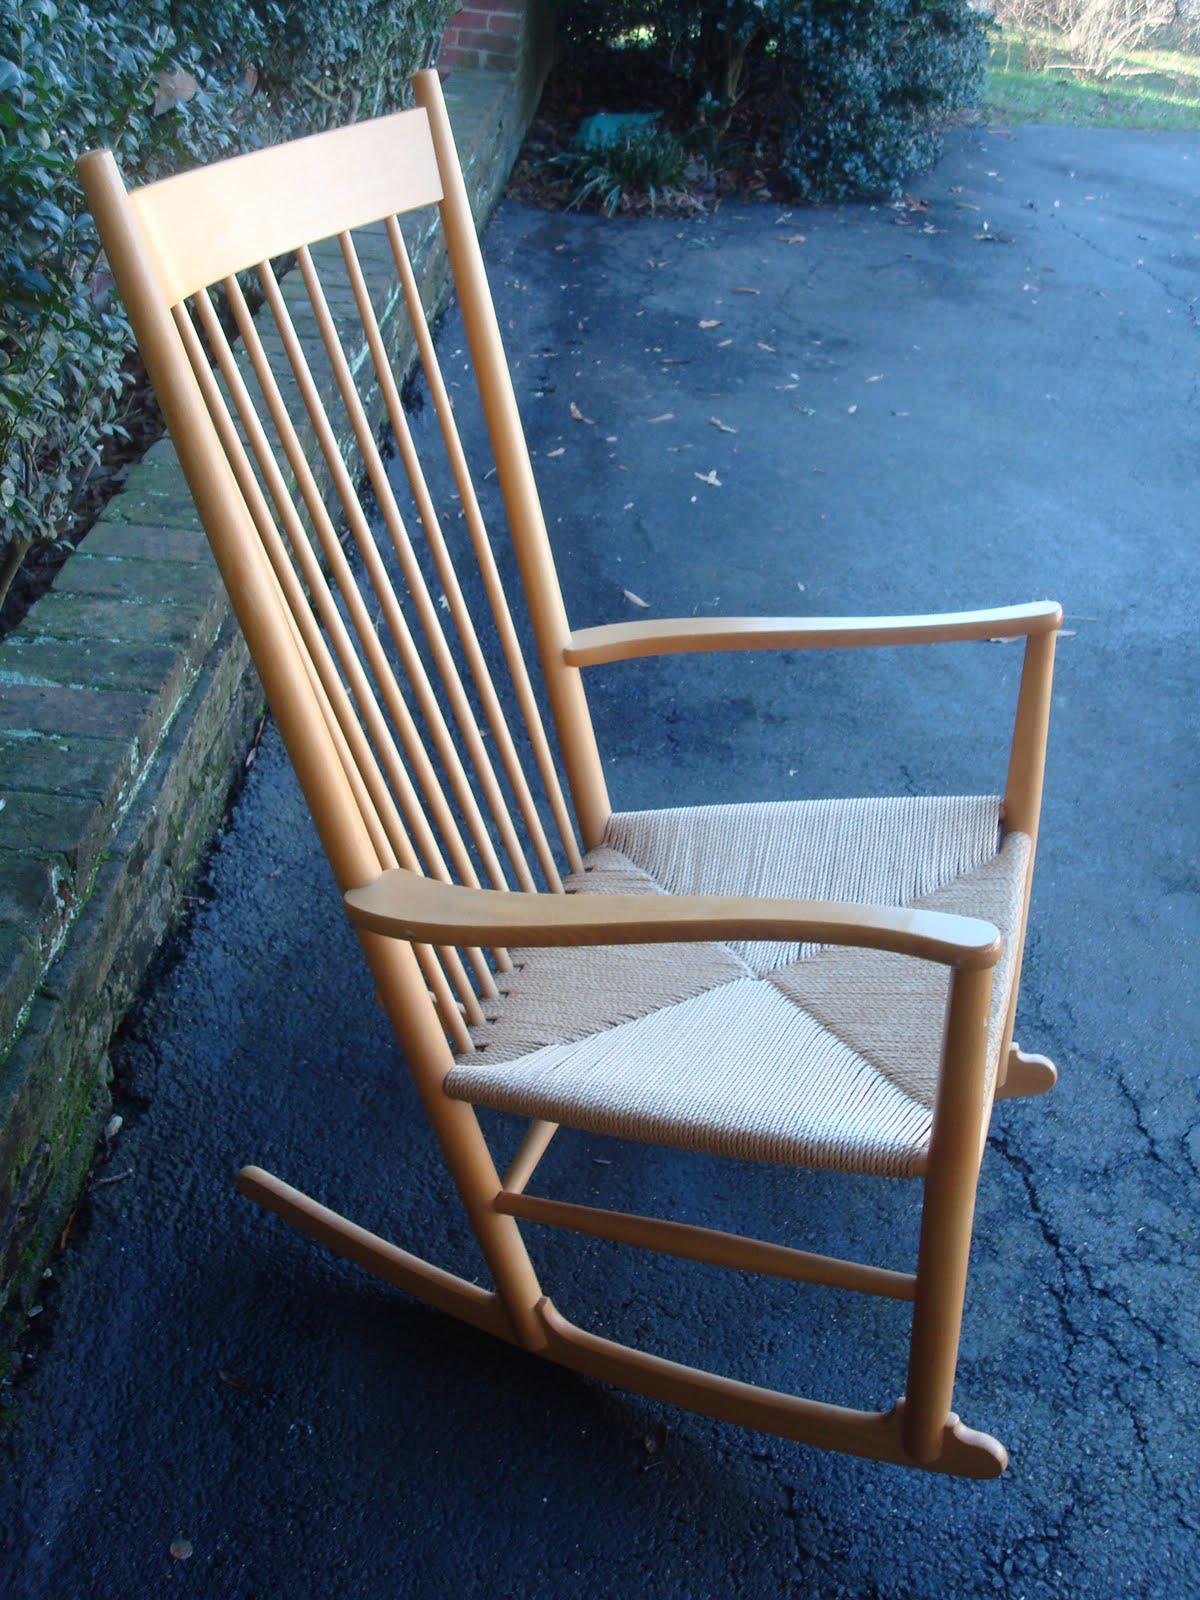 hans wegner rocking chair swivel club chairs canada gthans j j16 themodern60